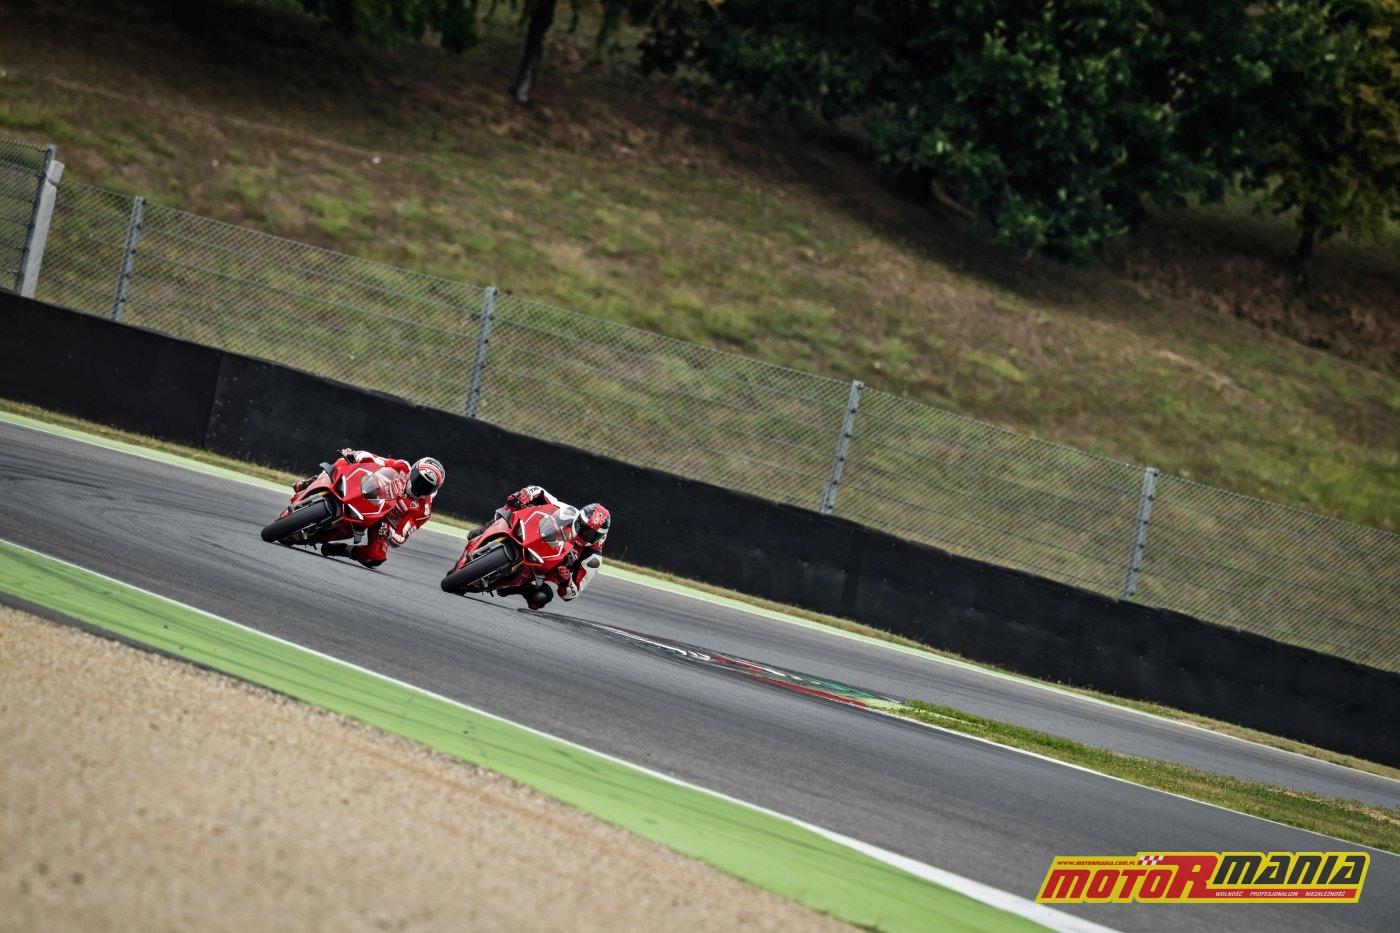 Ducati Panigale V4 R 2019 (21)